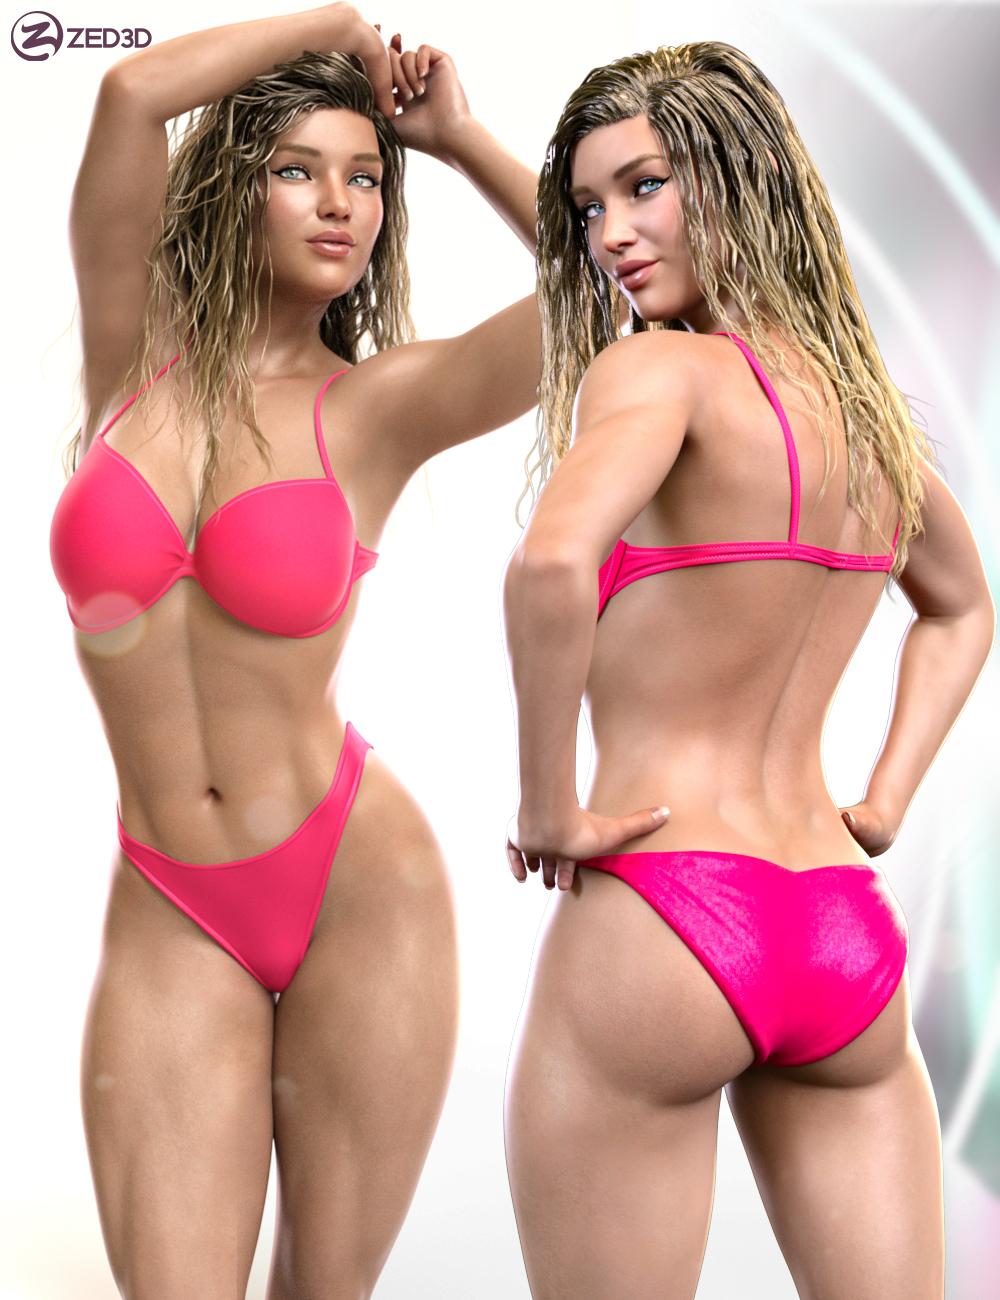 Z Beautifully Strong Shape and Pose Mega Set by: Zeddicuss, 3D Models by Daz 3D